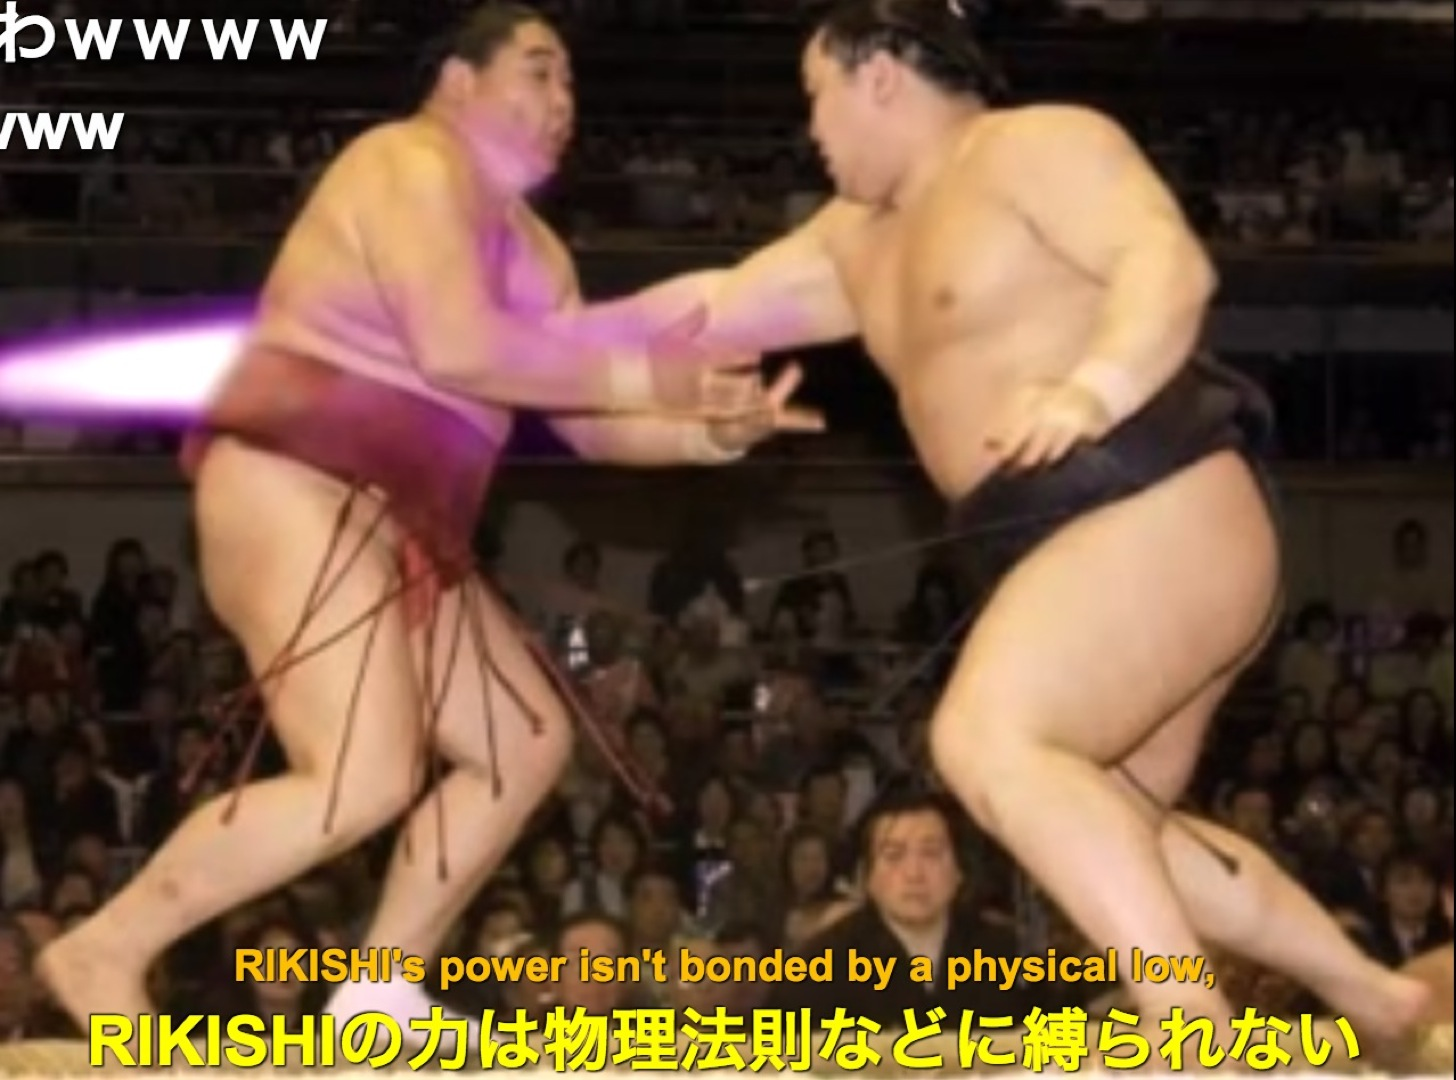 RIKISHIの力は物理法則などに縛られない